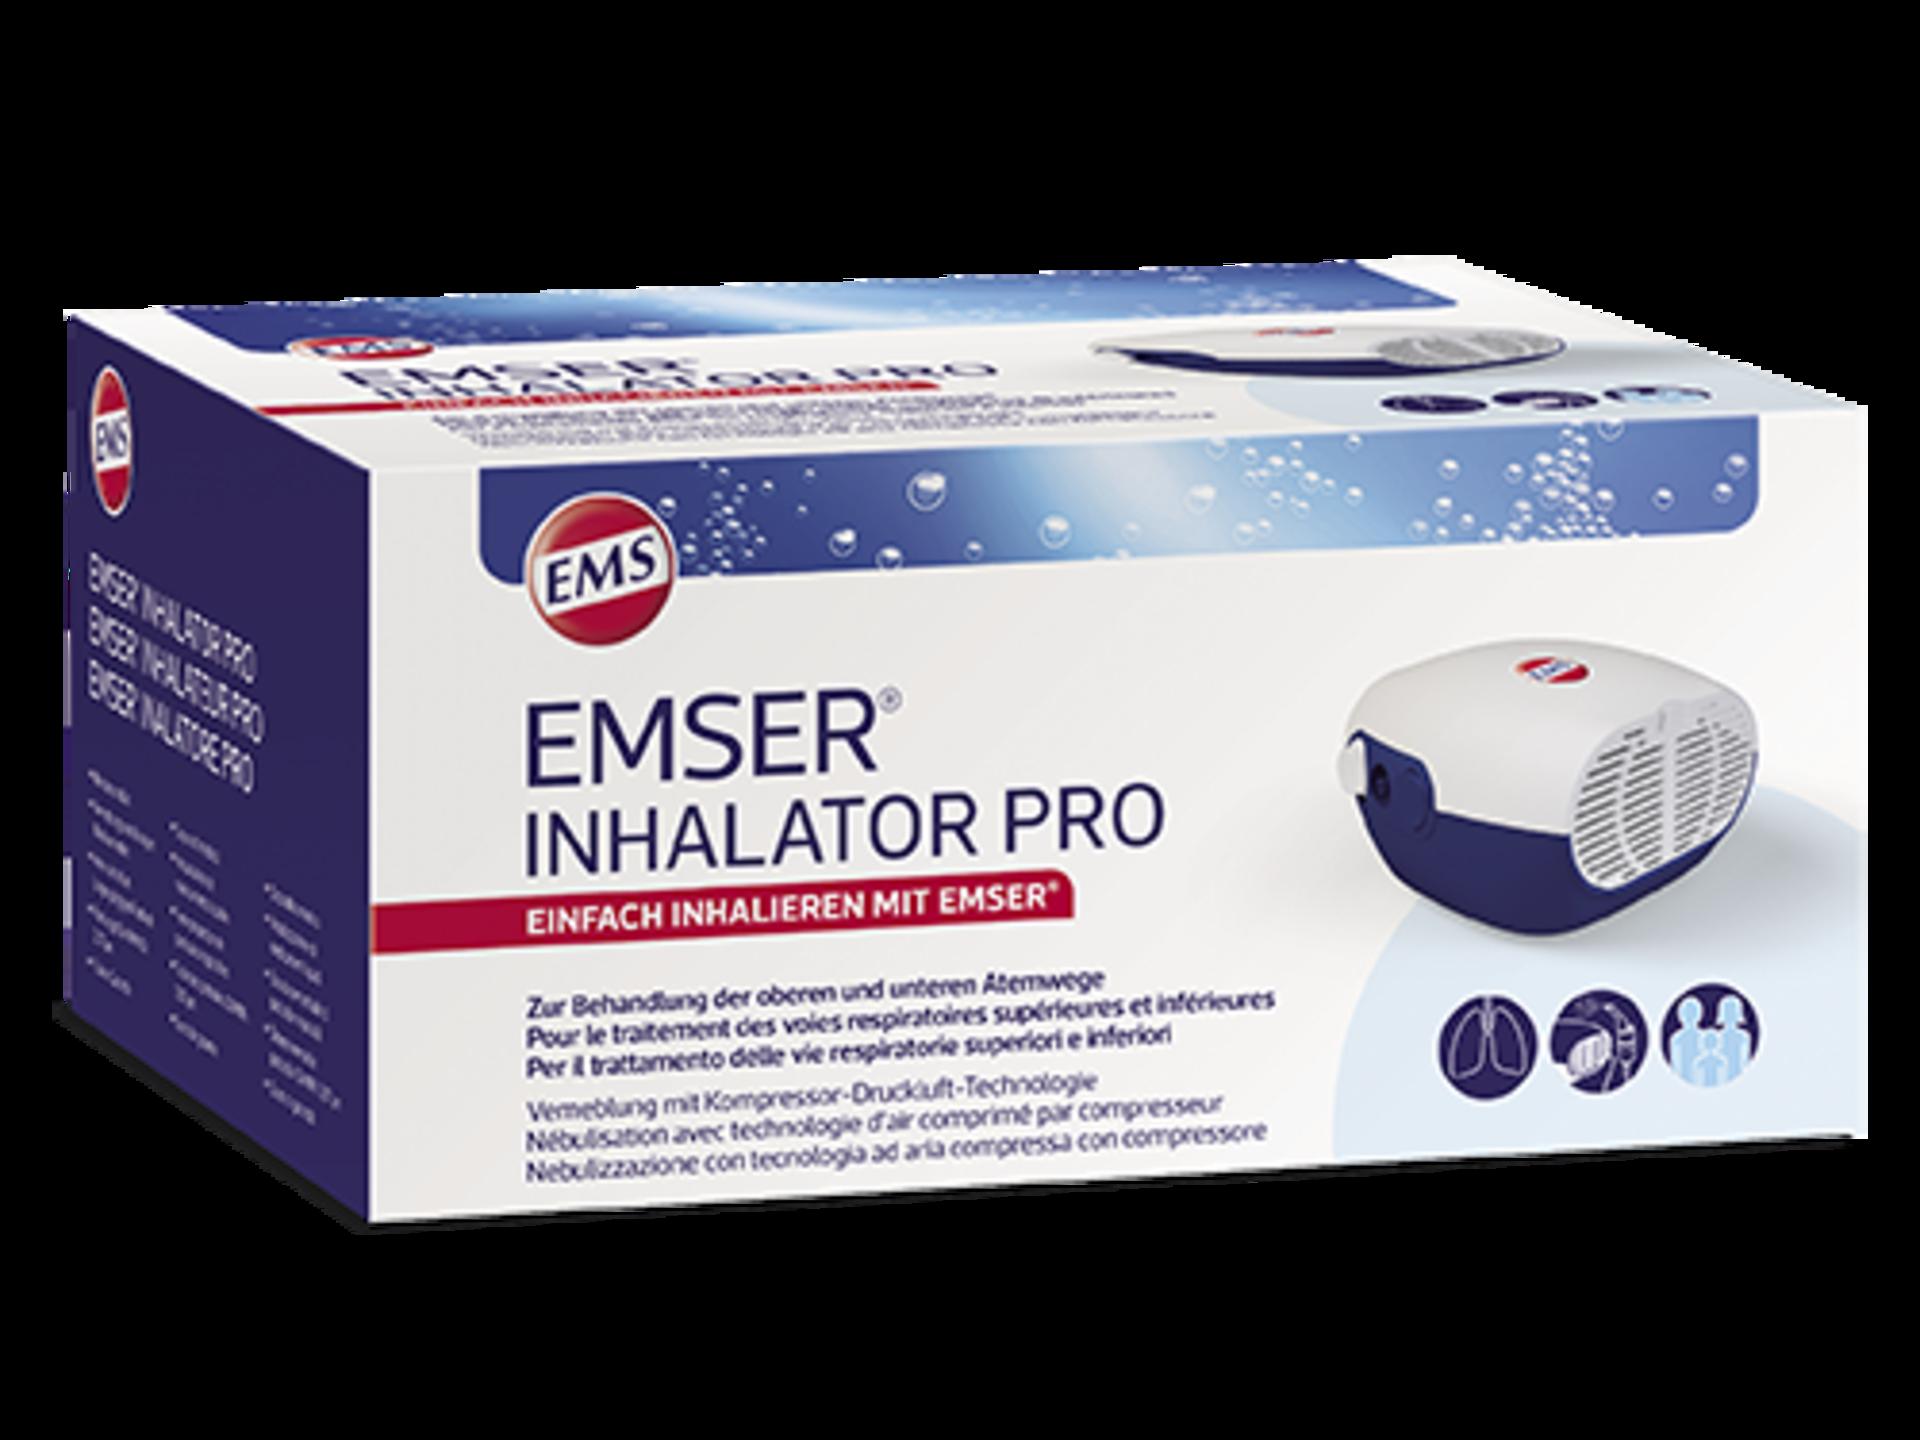 EMSER Inhalator Pro